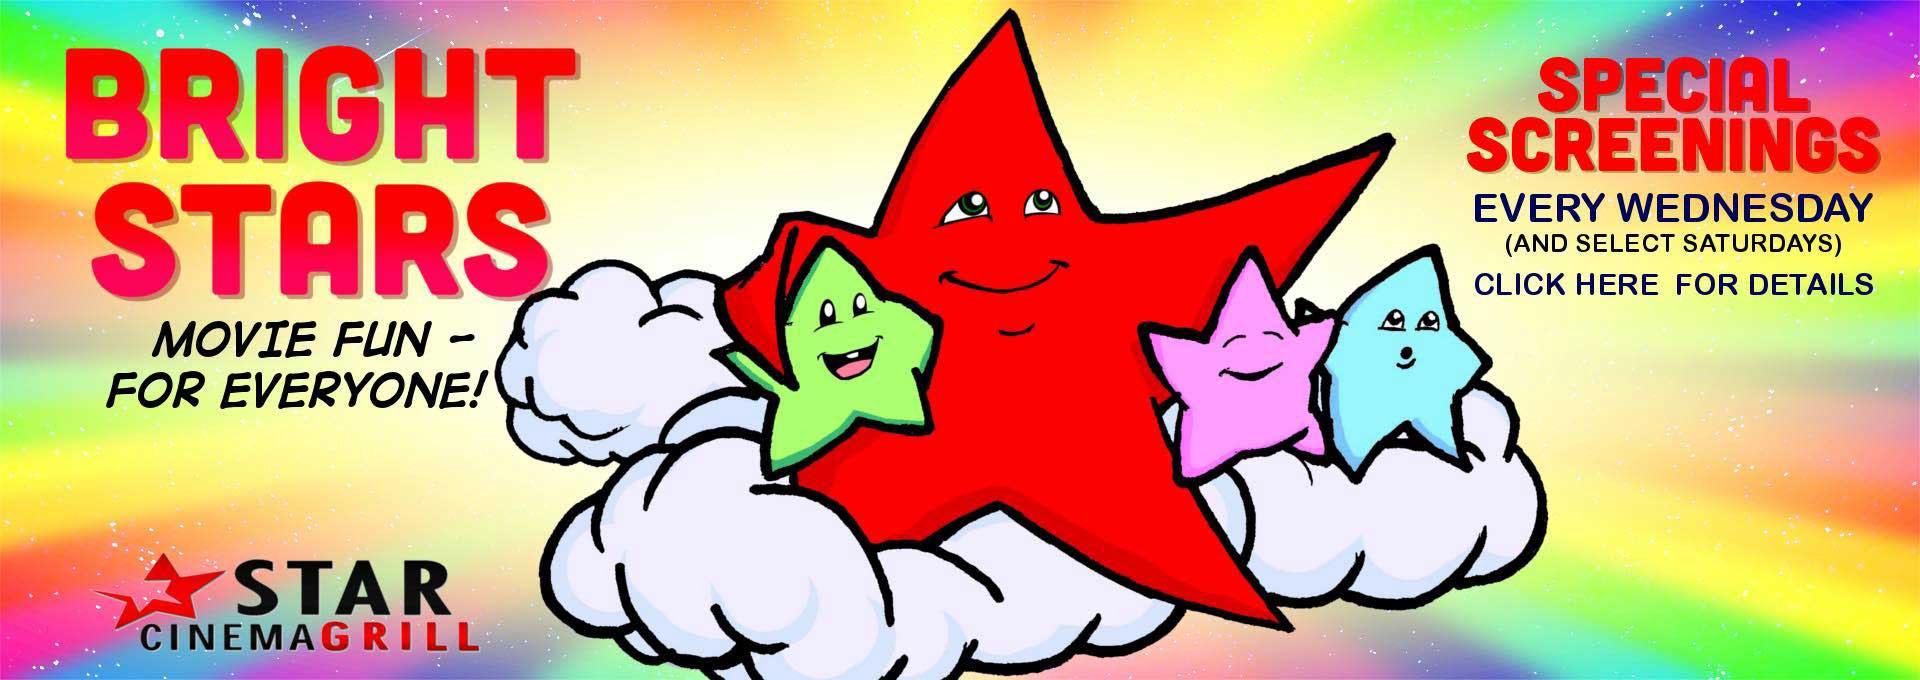 Bright Stars image